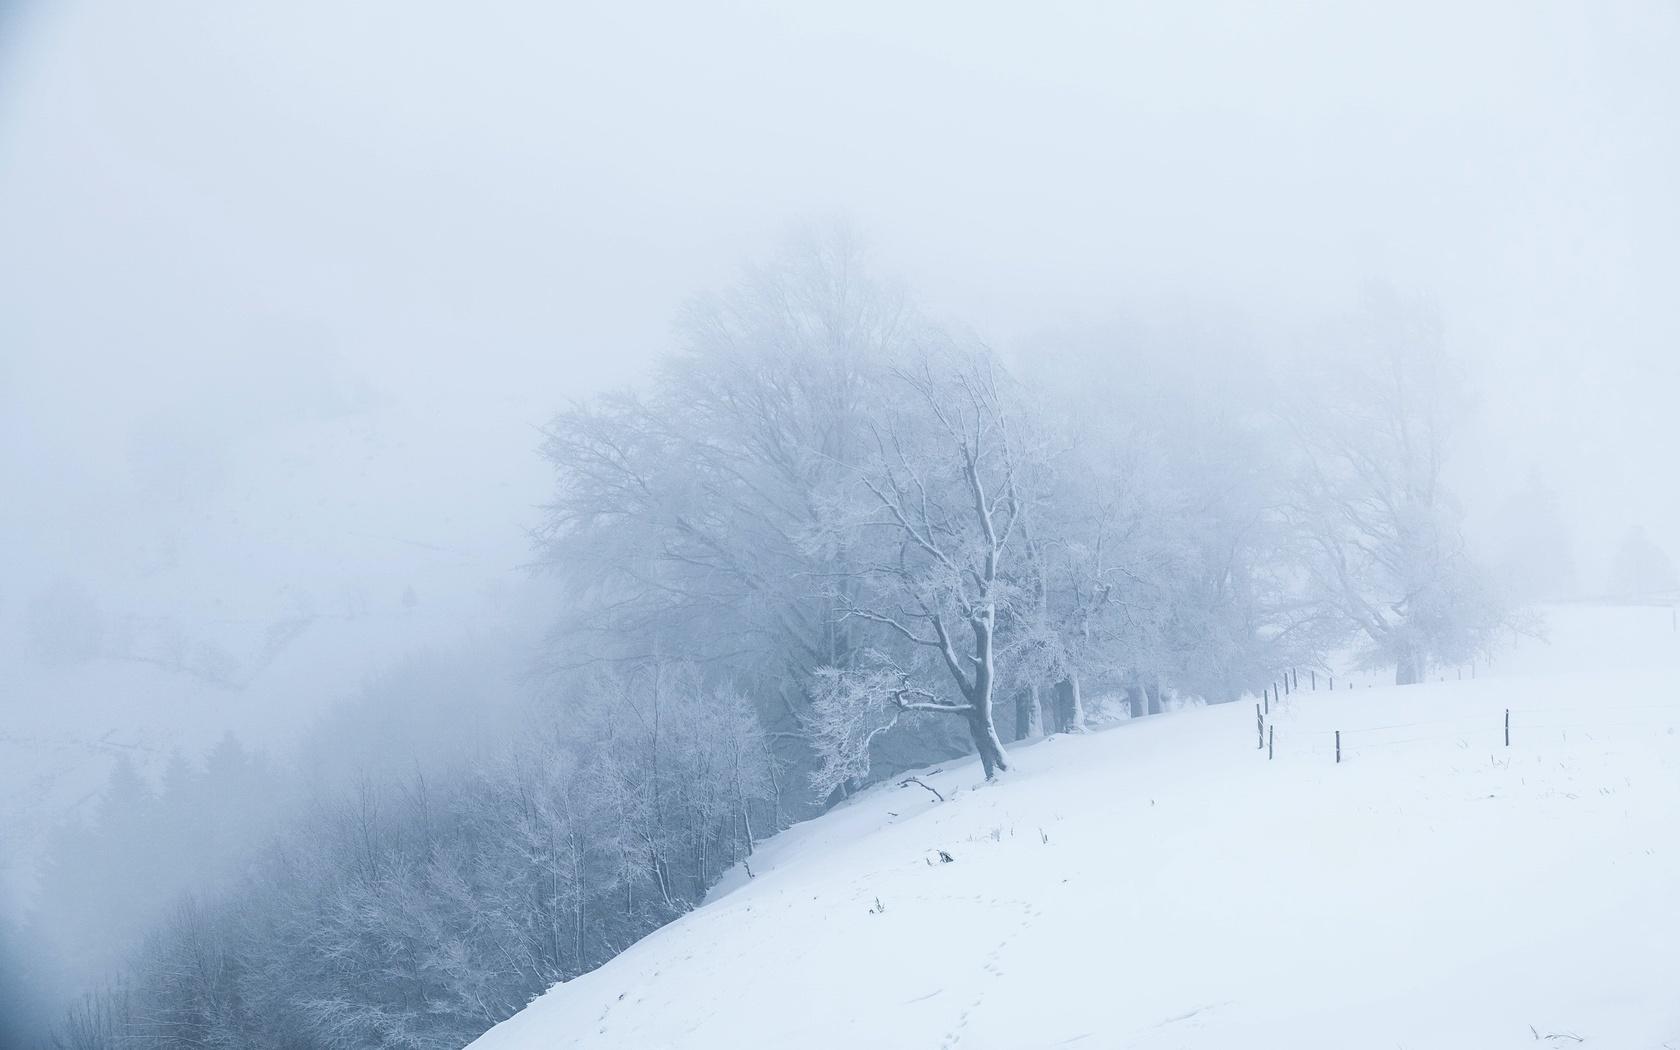 снег, белый мир, деревья, туман, утро, зима